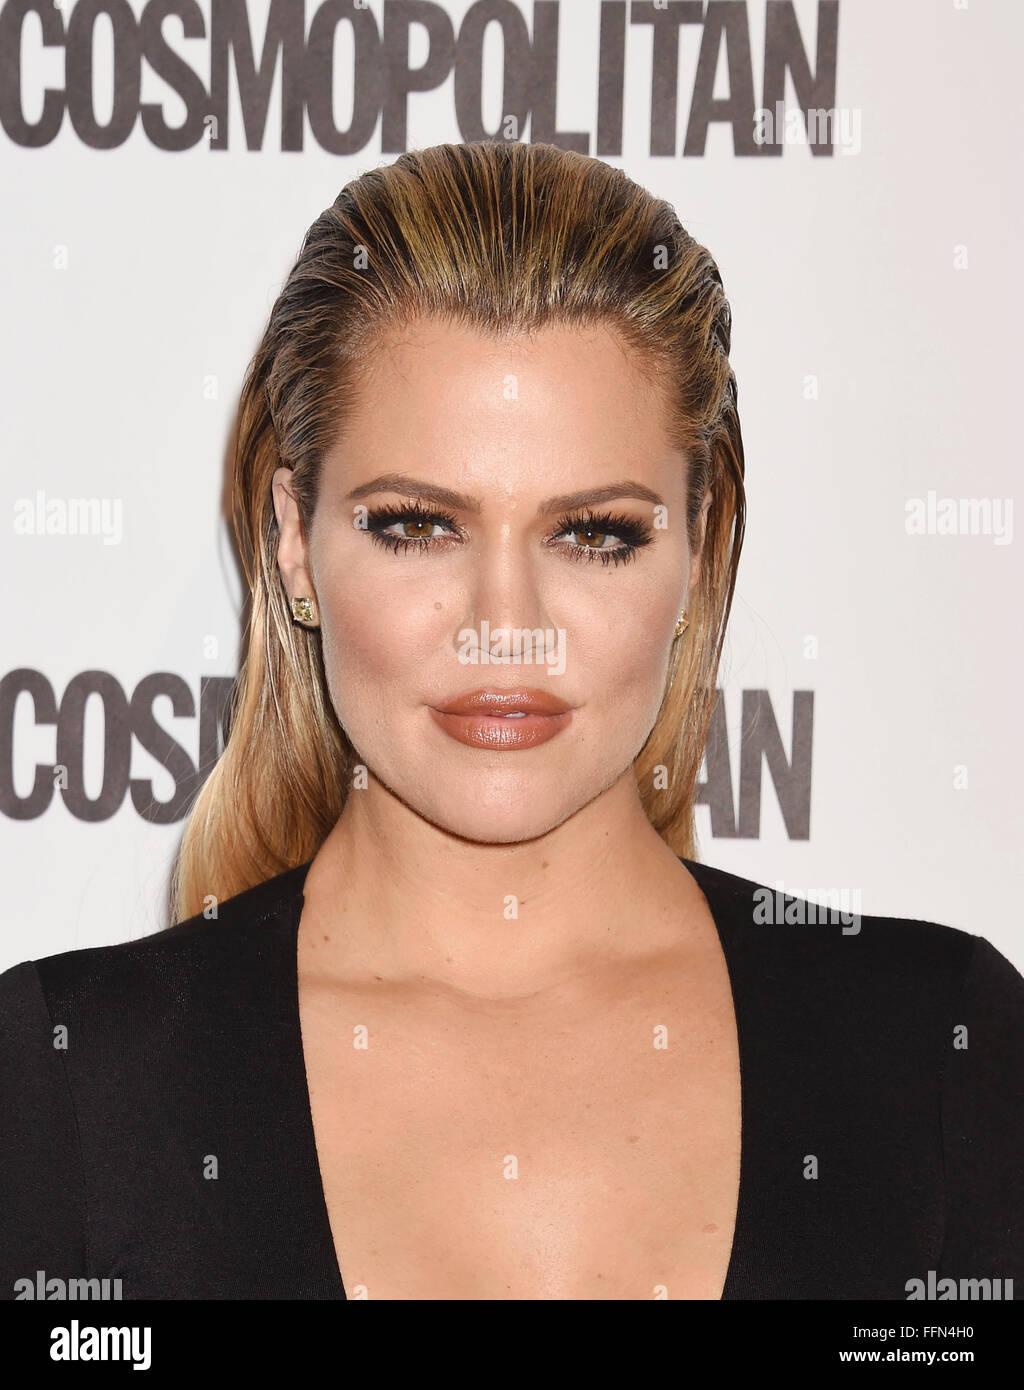 TV personality Khloe Kardashian arrives at Cosmopolitan Magazine's 50th Birthday Celebration at Ysabel on October - Stock Image